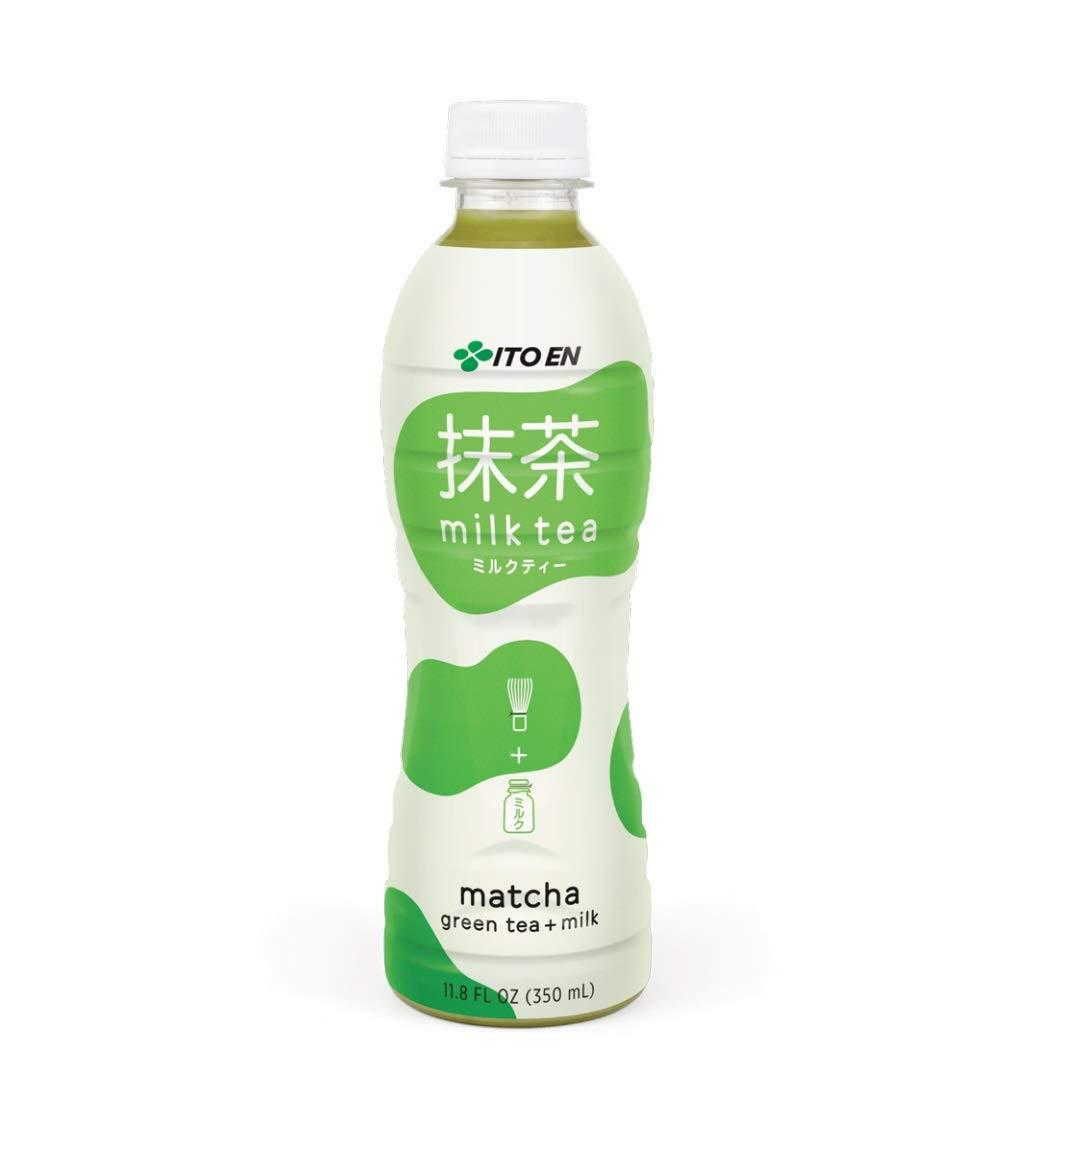 Ito En Matcha Green Tea + Milk Milk Tea 11.8 oz Plastic Bottles - Pack of 12